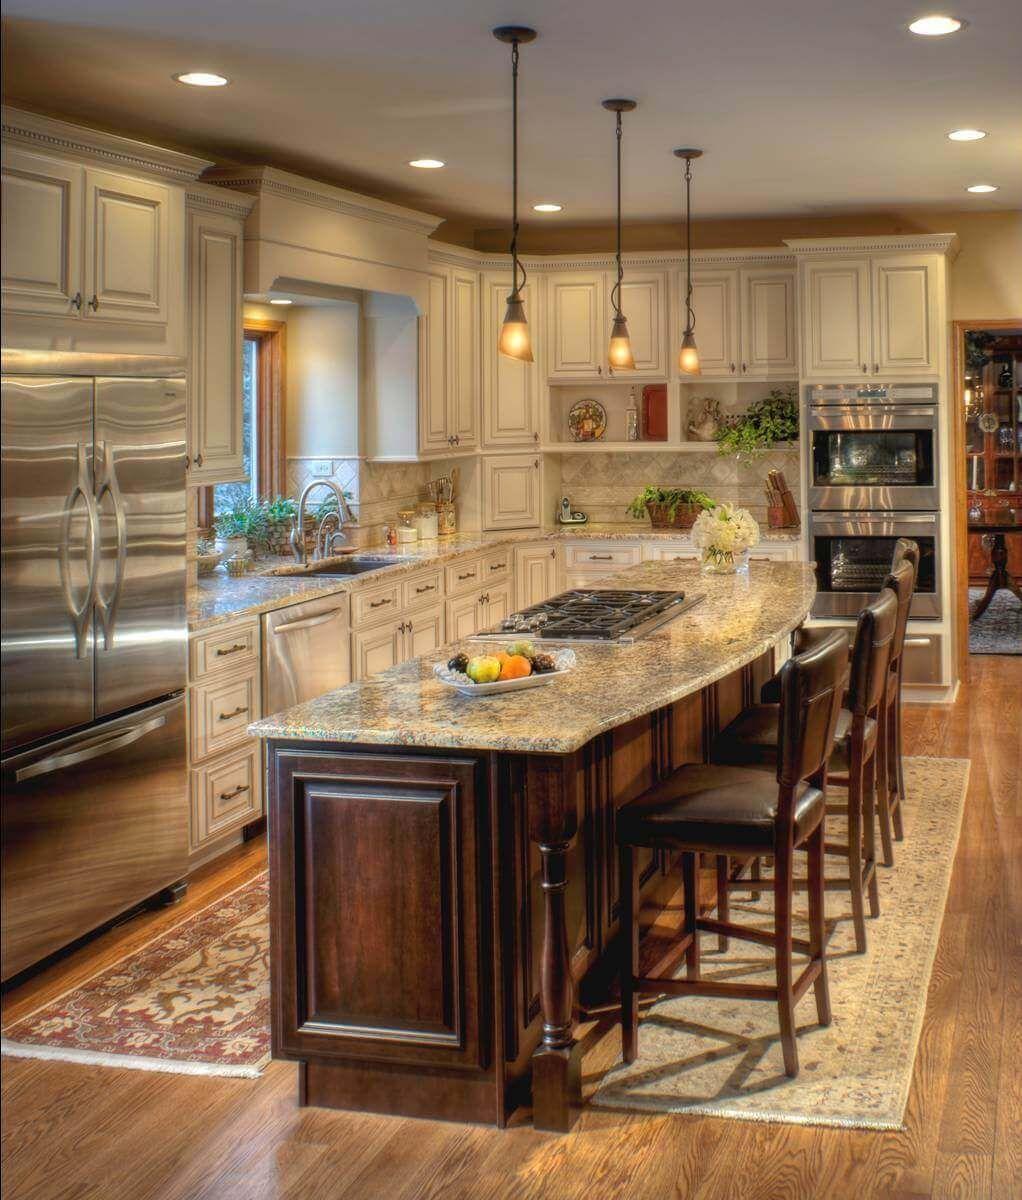 68 Deluxe Custom Kitchen Island Ideas Jaw Dropping Designs Custom Kitchen Island Kitchen Island Design Kitchen Layout